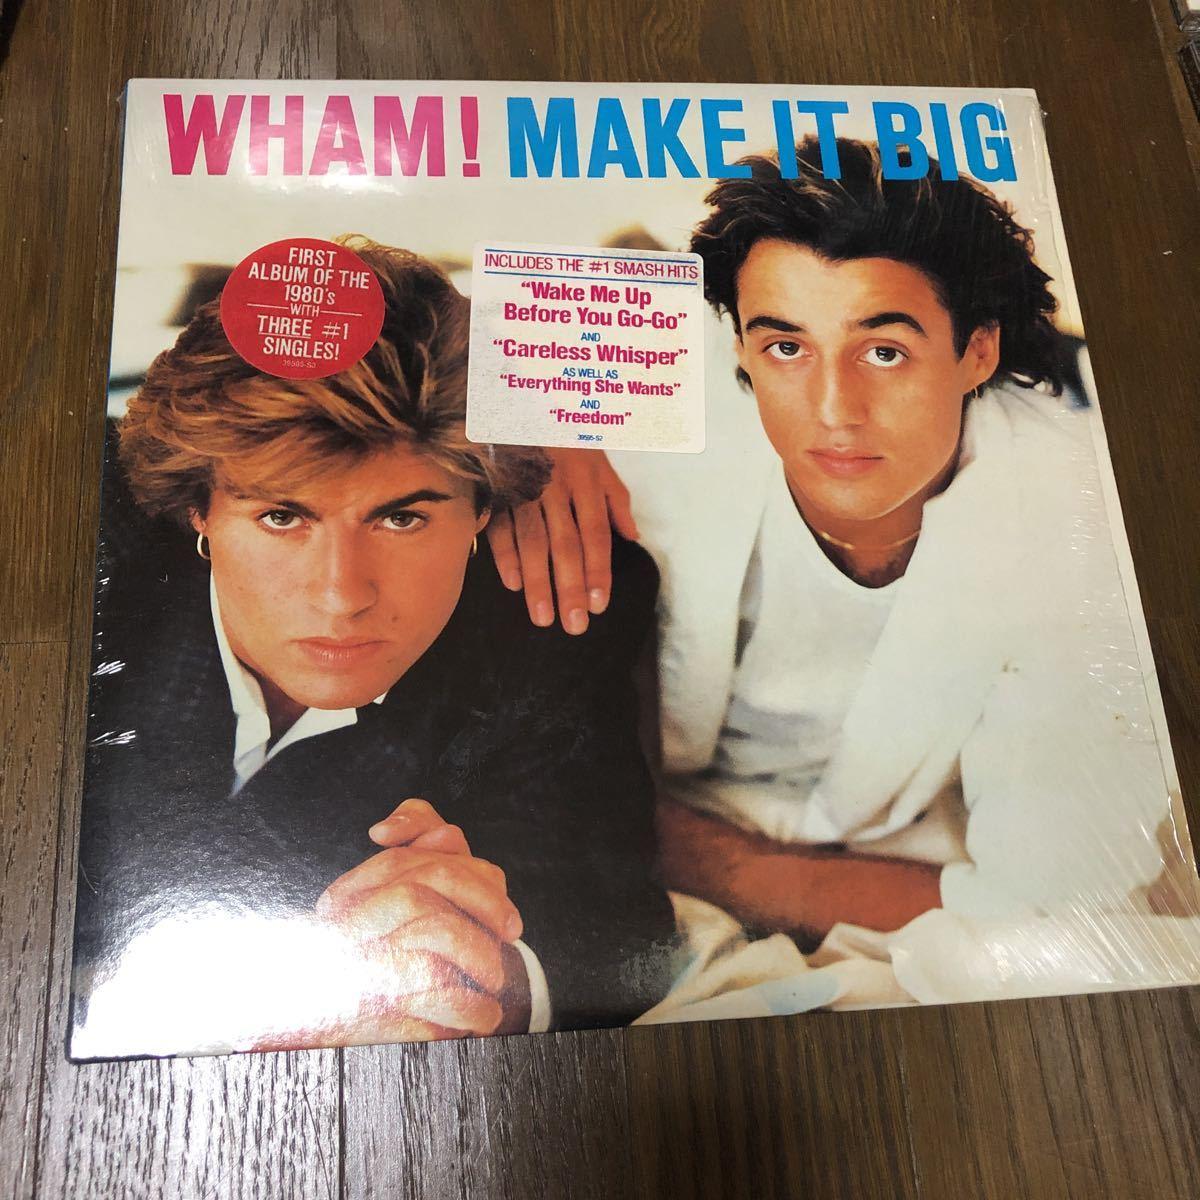 Wham! Make It Big USA盤レコード【シュリンク残】_画像1